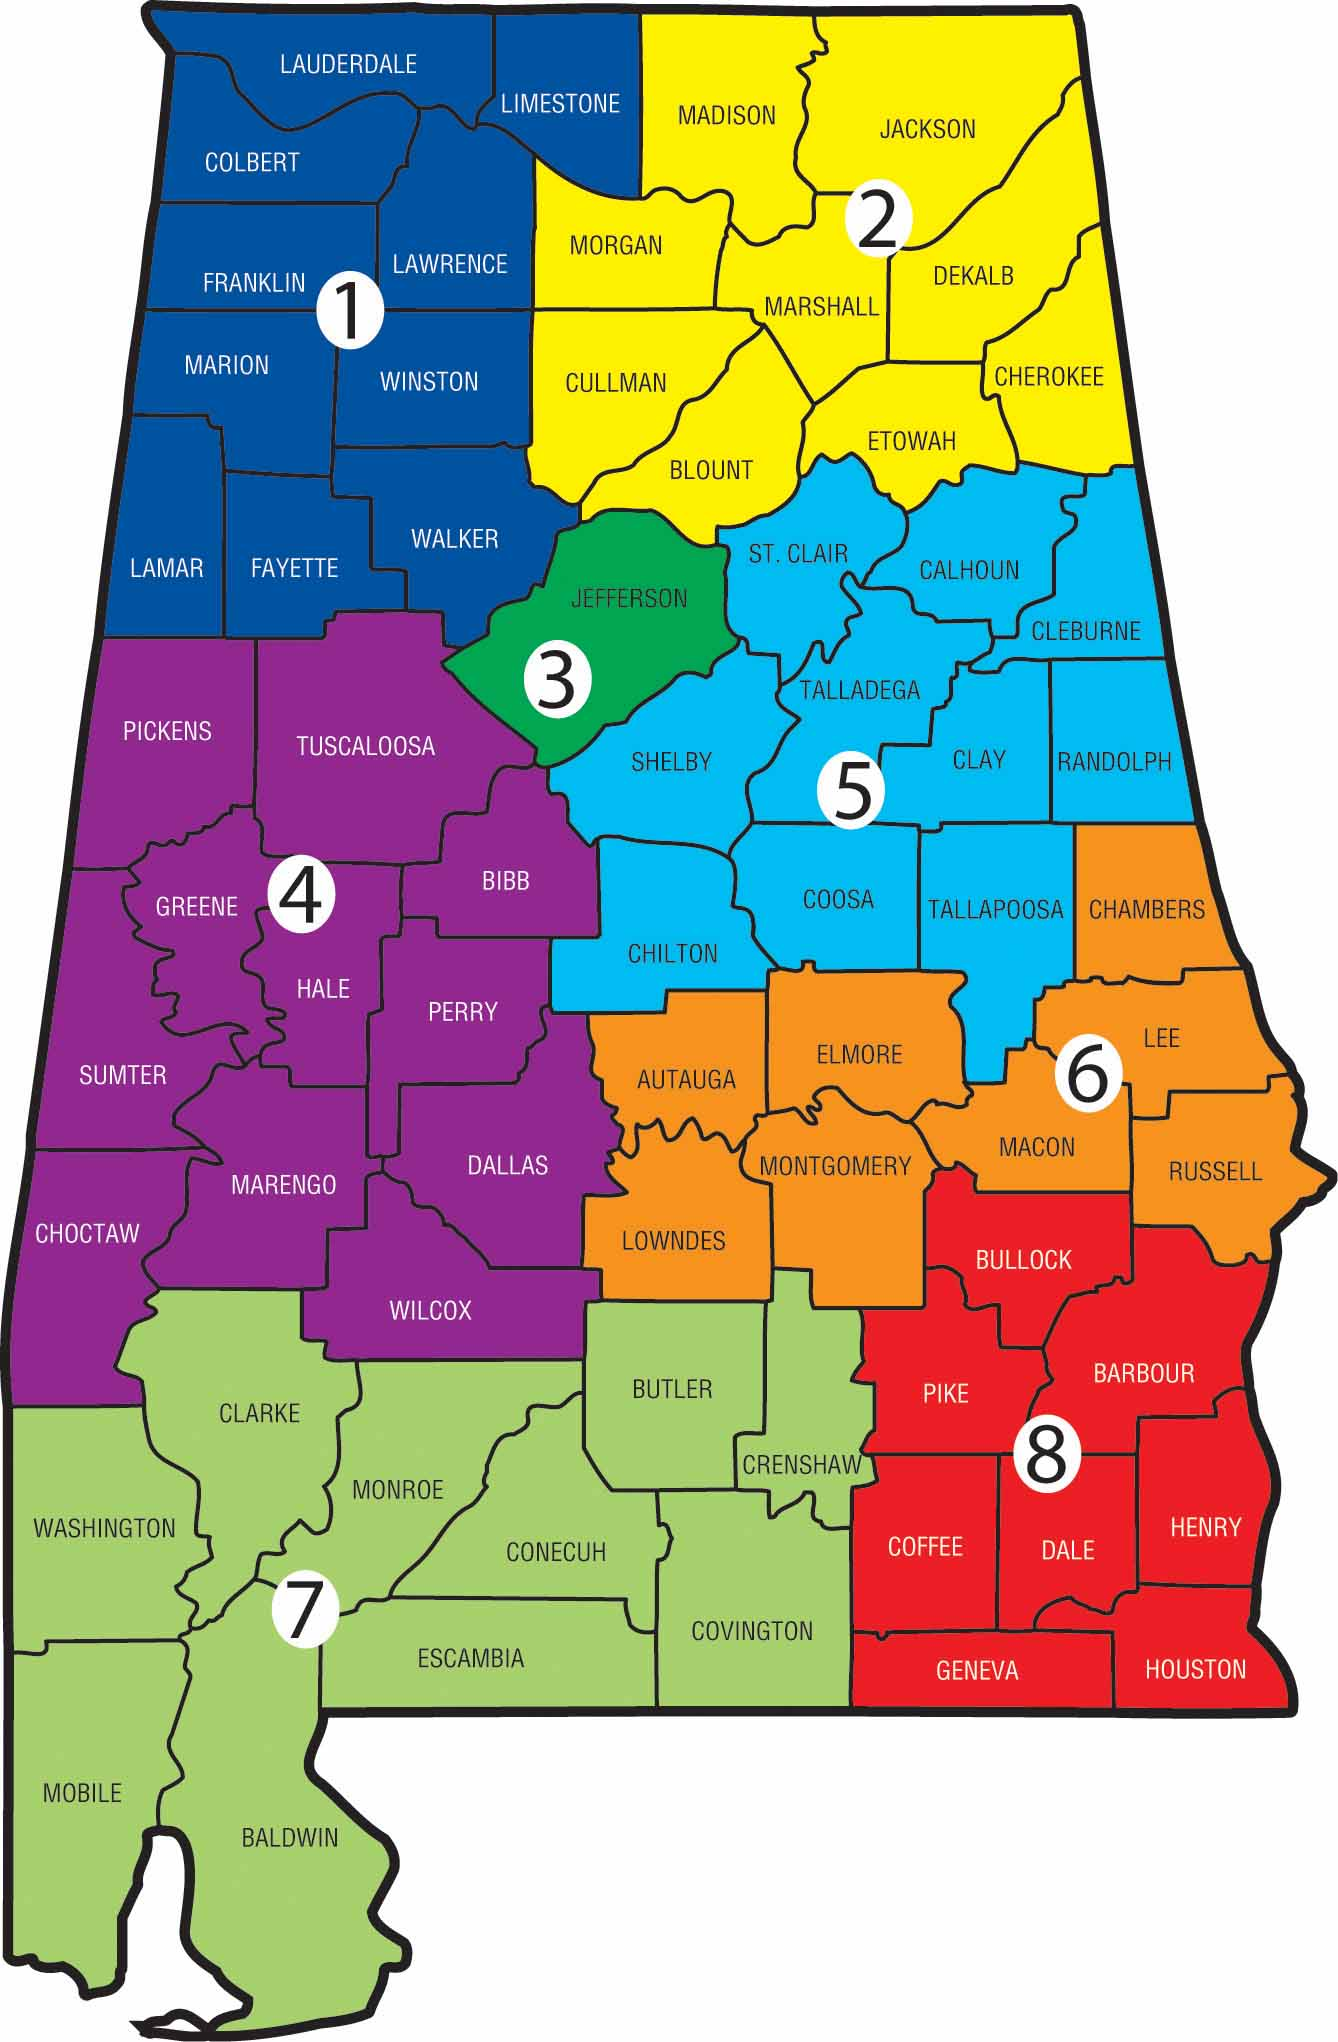 Alabama Geography